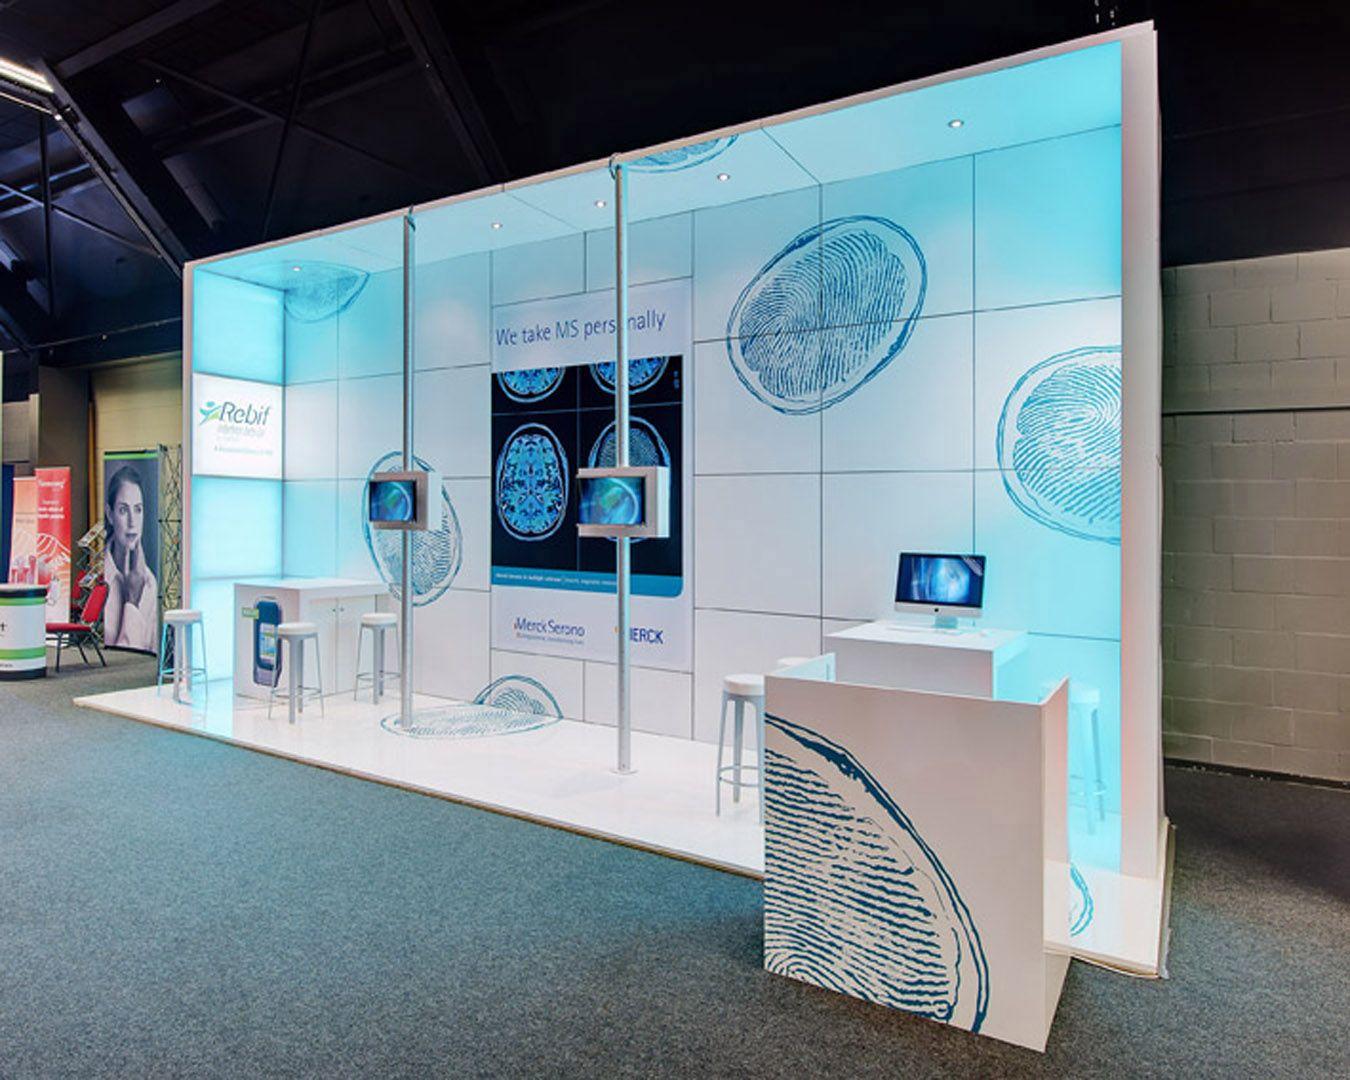 Laarhoven design amsterdam for Design agencies amsterdam